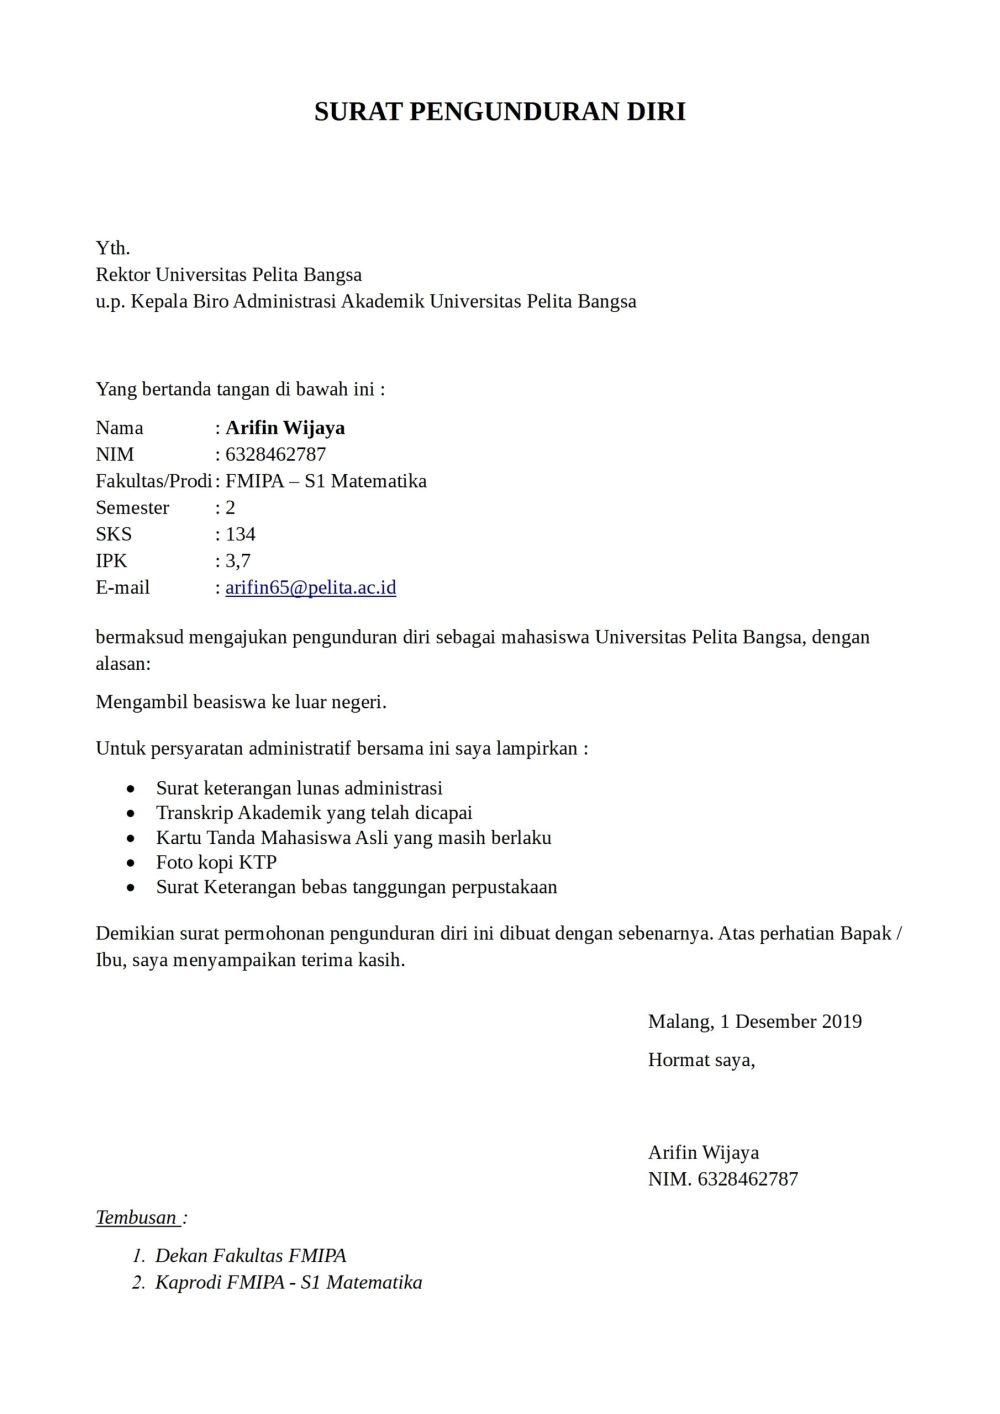 9. Contoh Surat Risent Kuliah